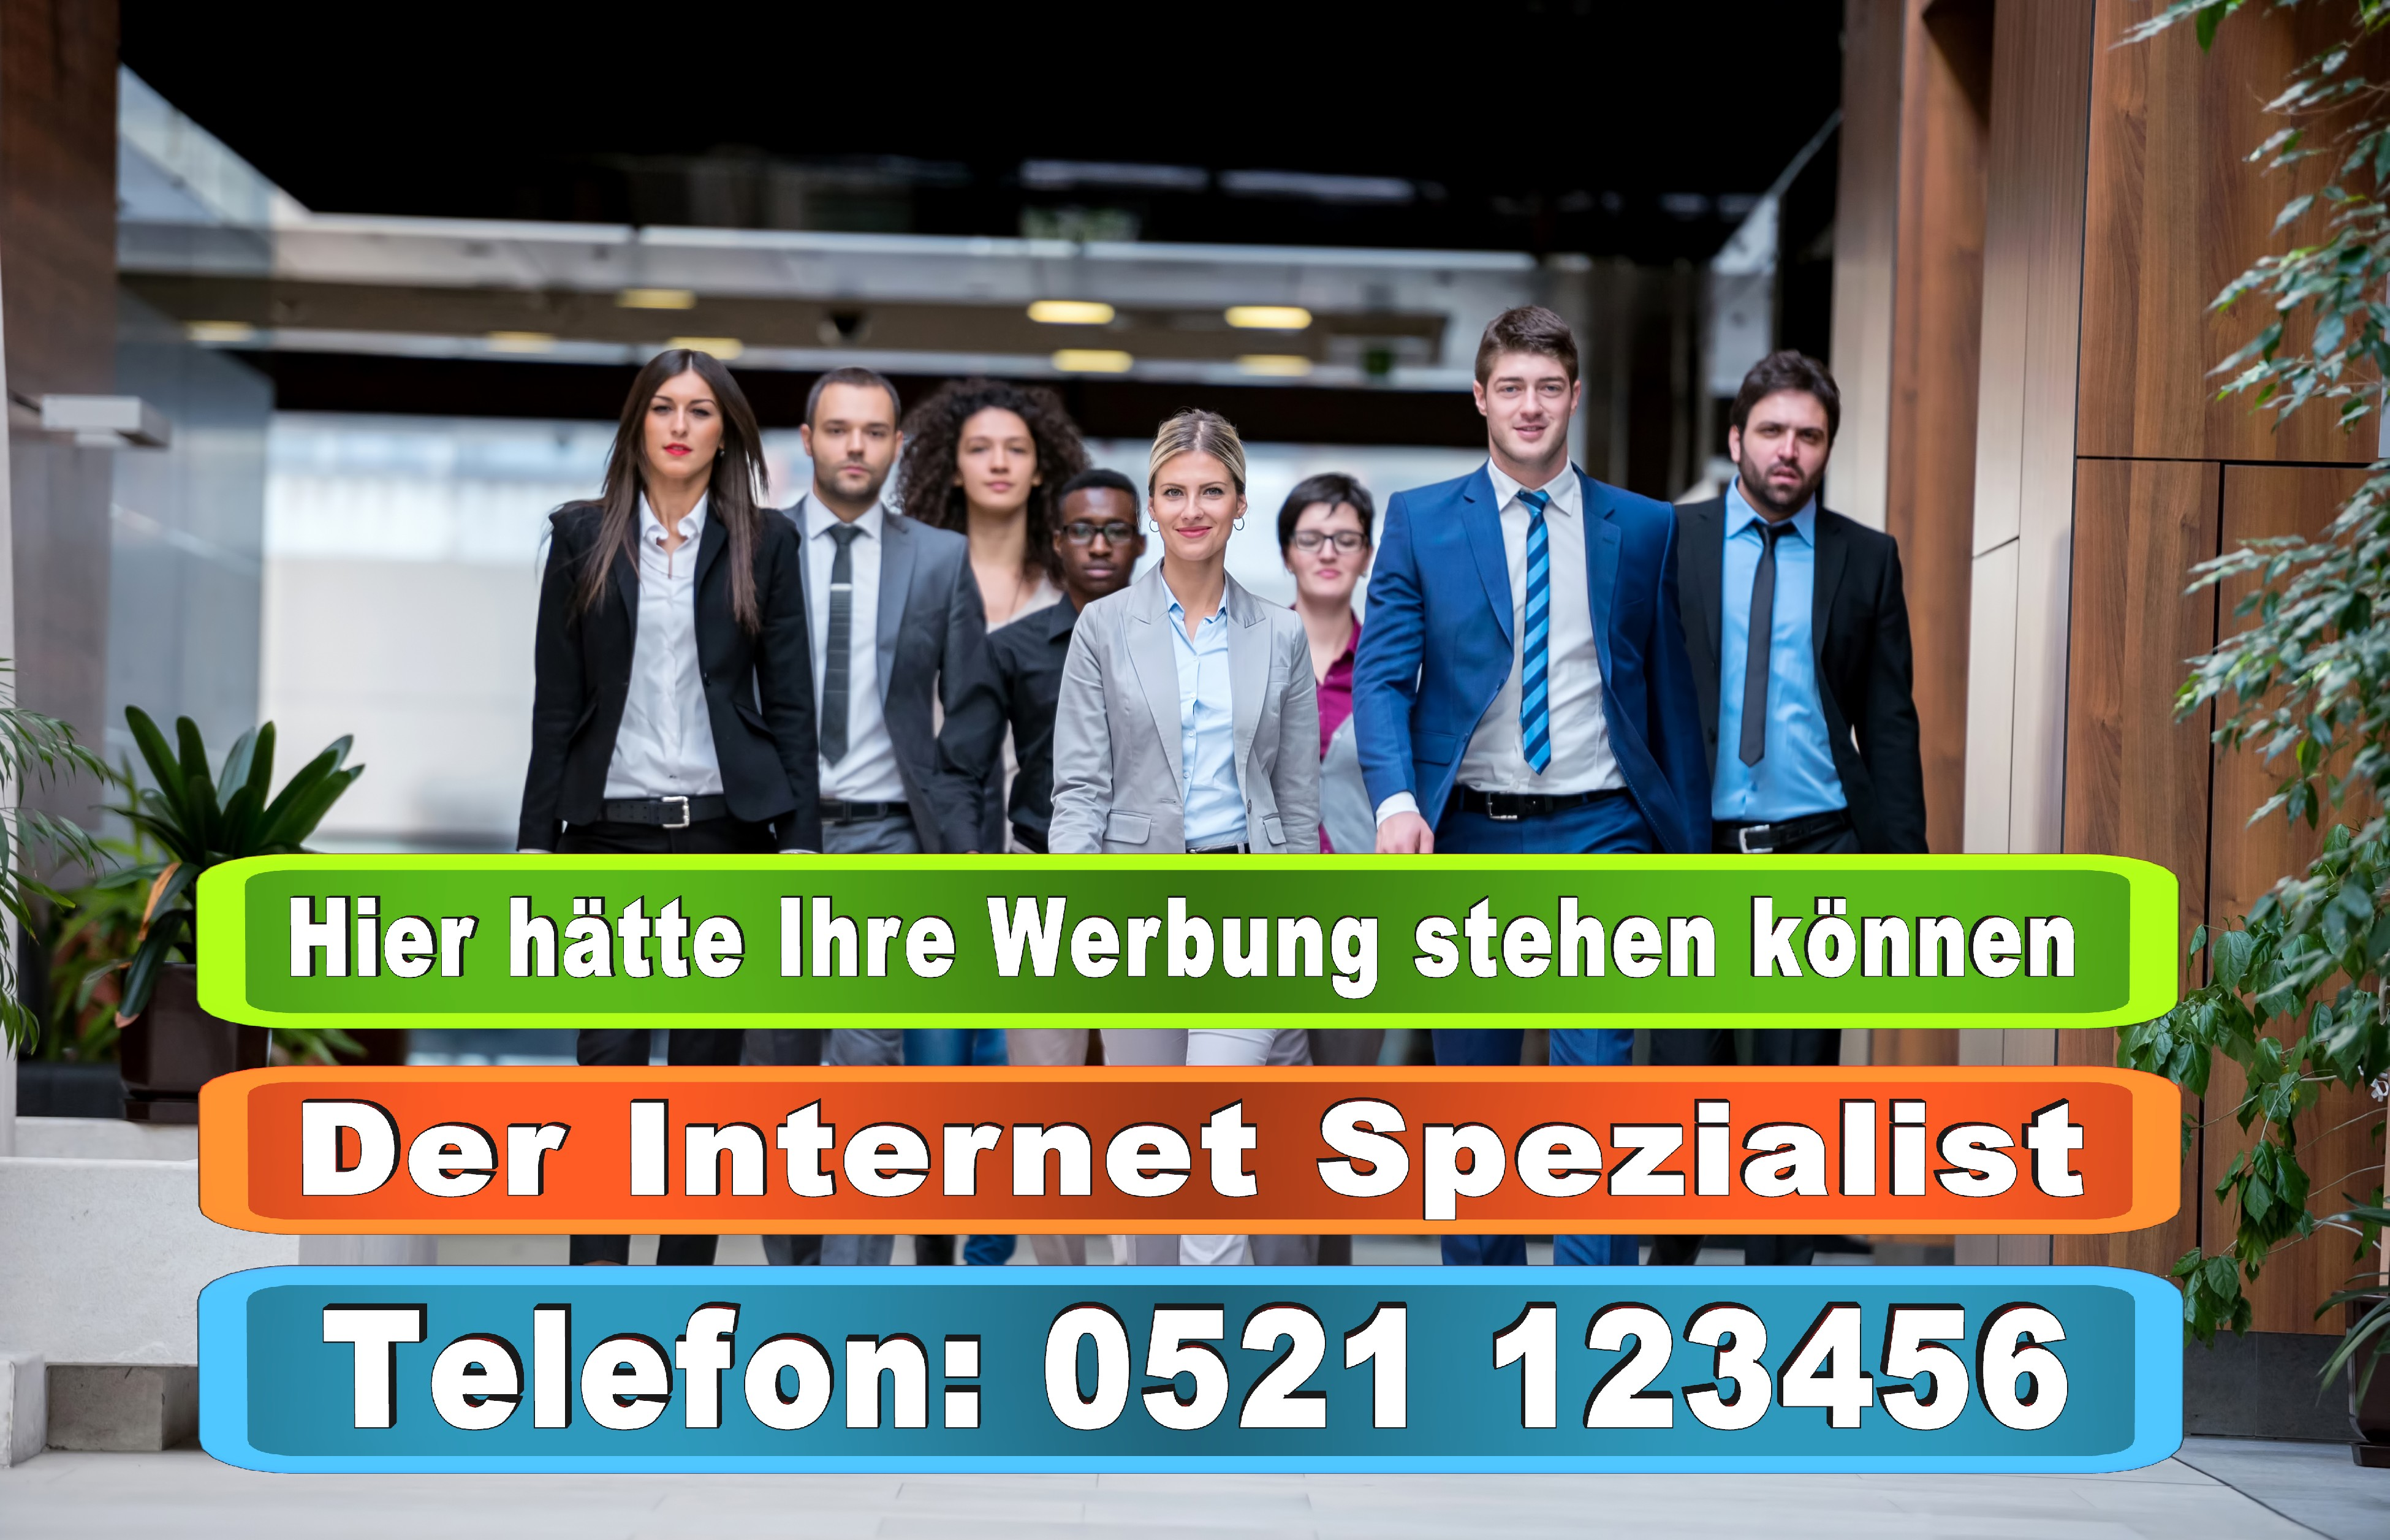 Rechtsanwaltskanzlei Bielefeld NRW OWL Rechtsanwalt Kanzlei Büro Steuerberater Bielefeld Architekt Bielefeld (13)